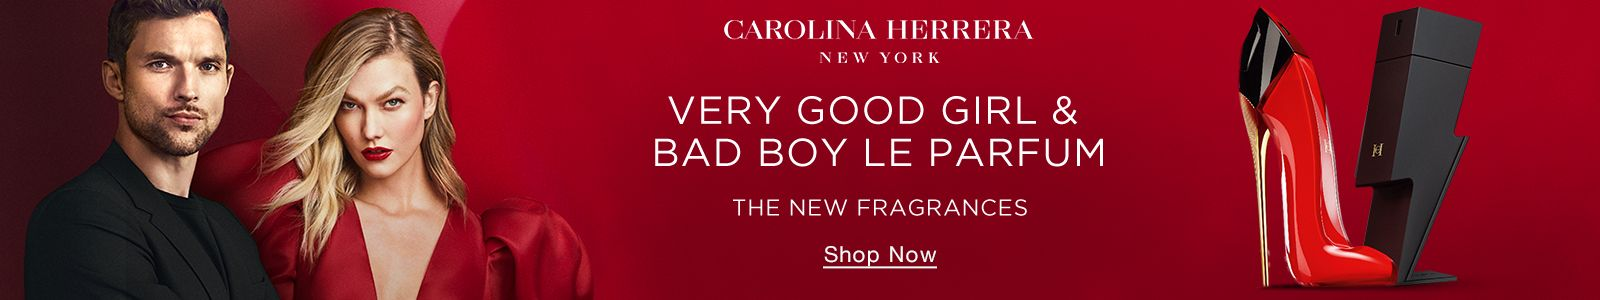 Caroline Herrera, New York, Very Good Girl and Bad Boy Le Parfum, The New Fragrances